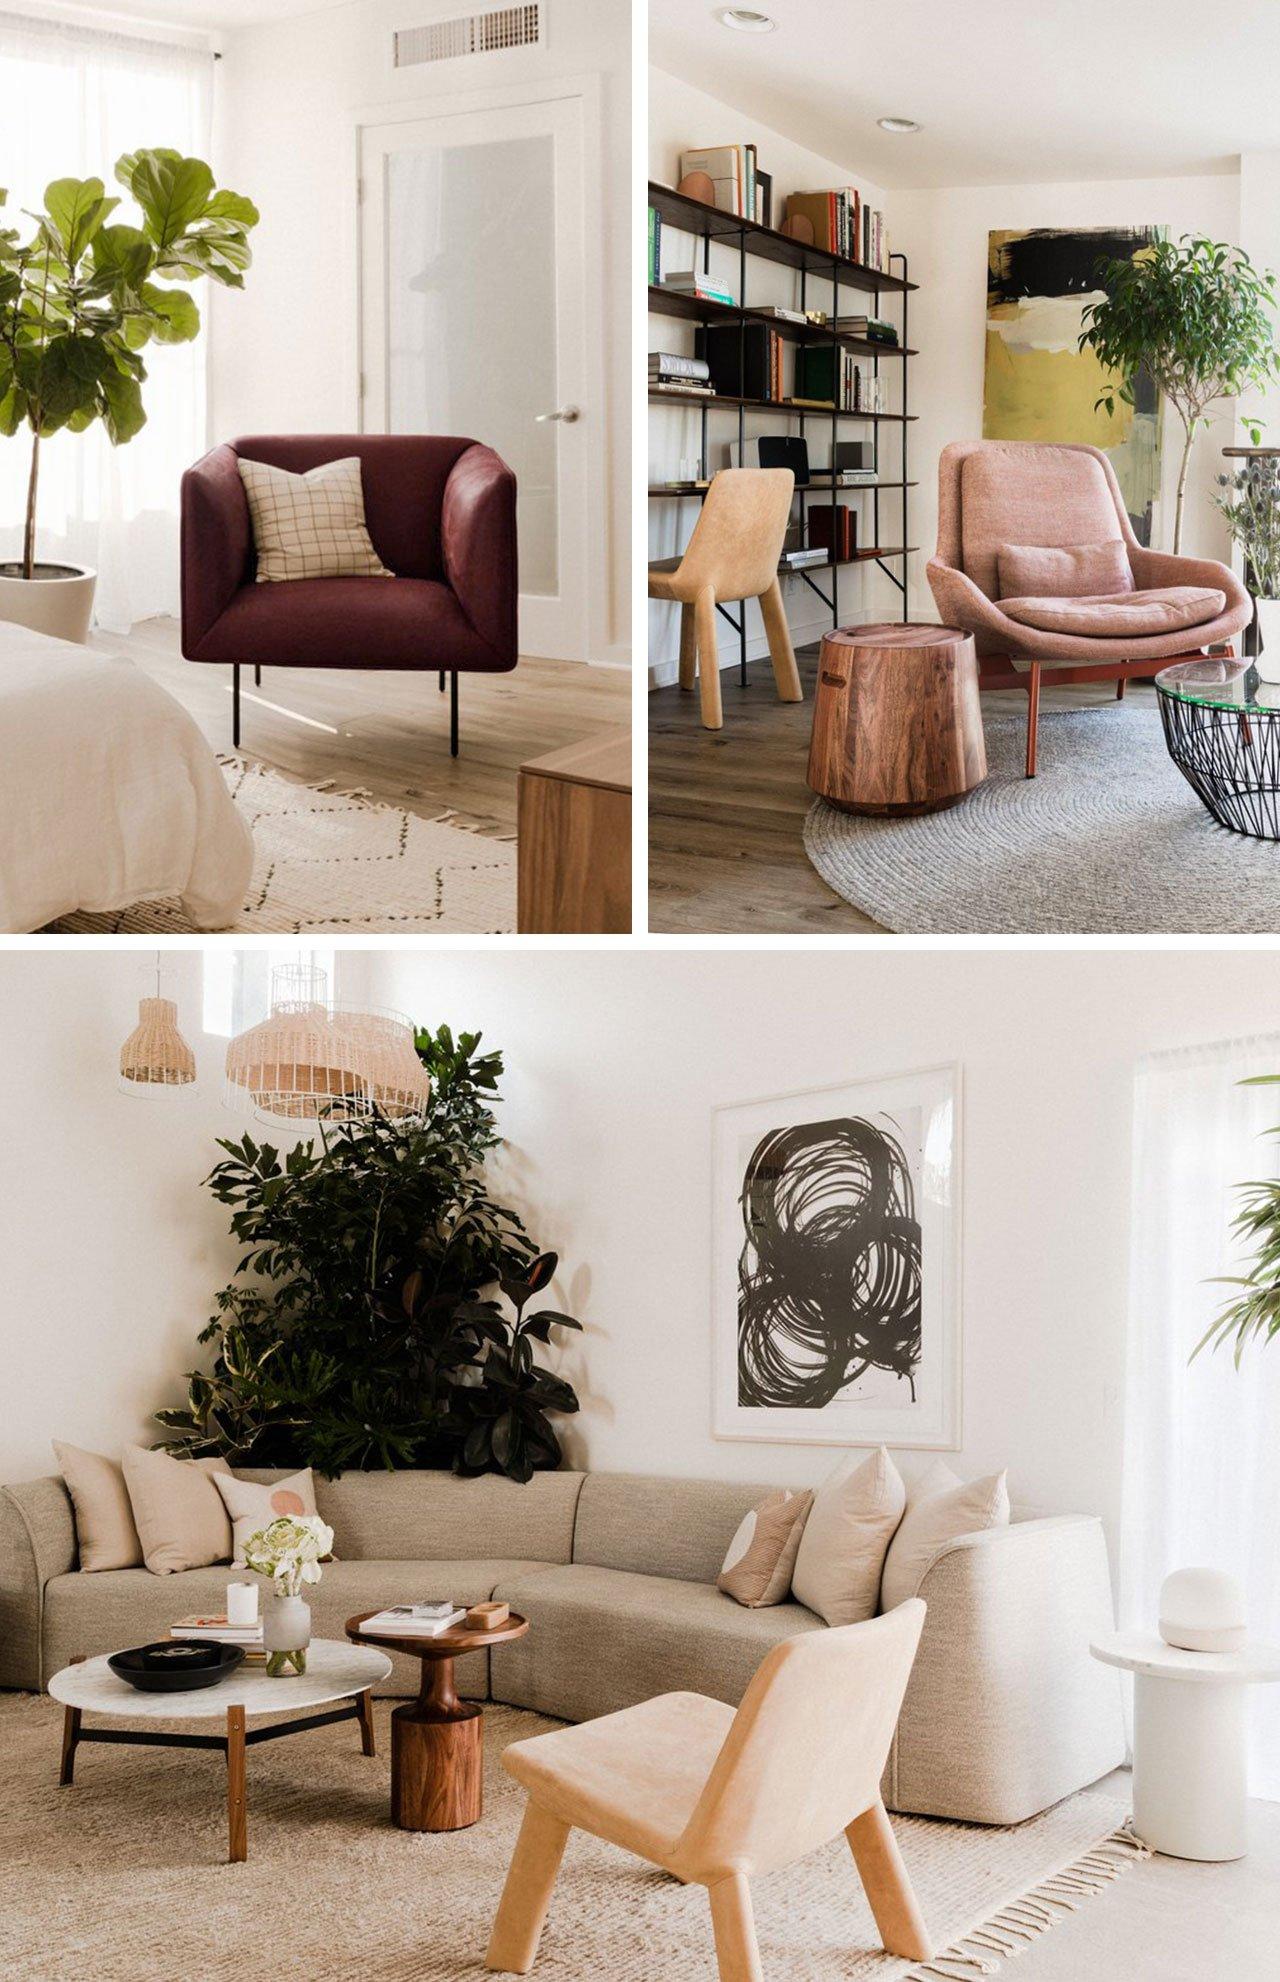 Phenomenal Bludot Blu Dots February Newsletter Milled Ibusinesslaw Wood Chair Design Ideas Ibusinesslaworg